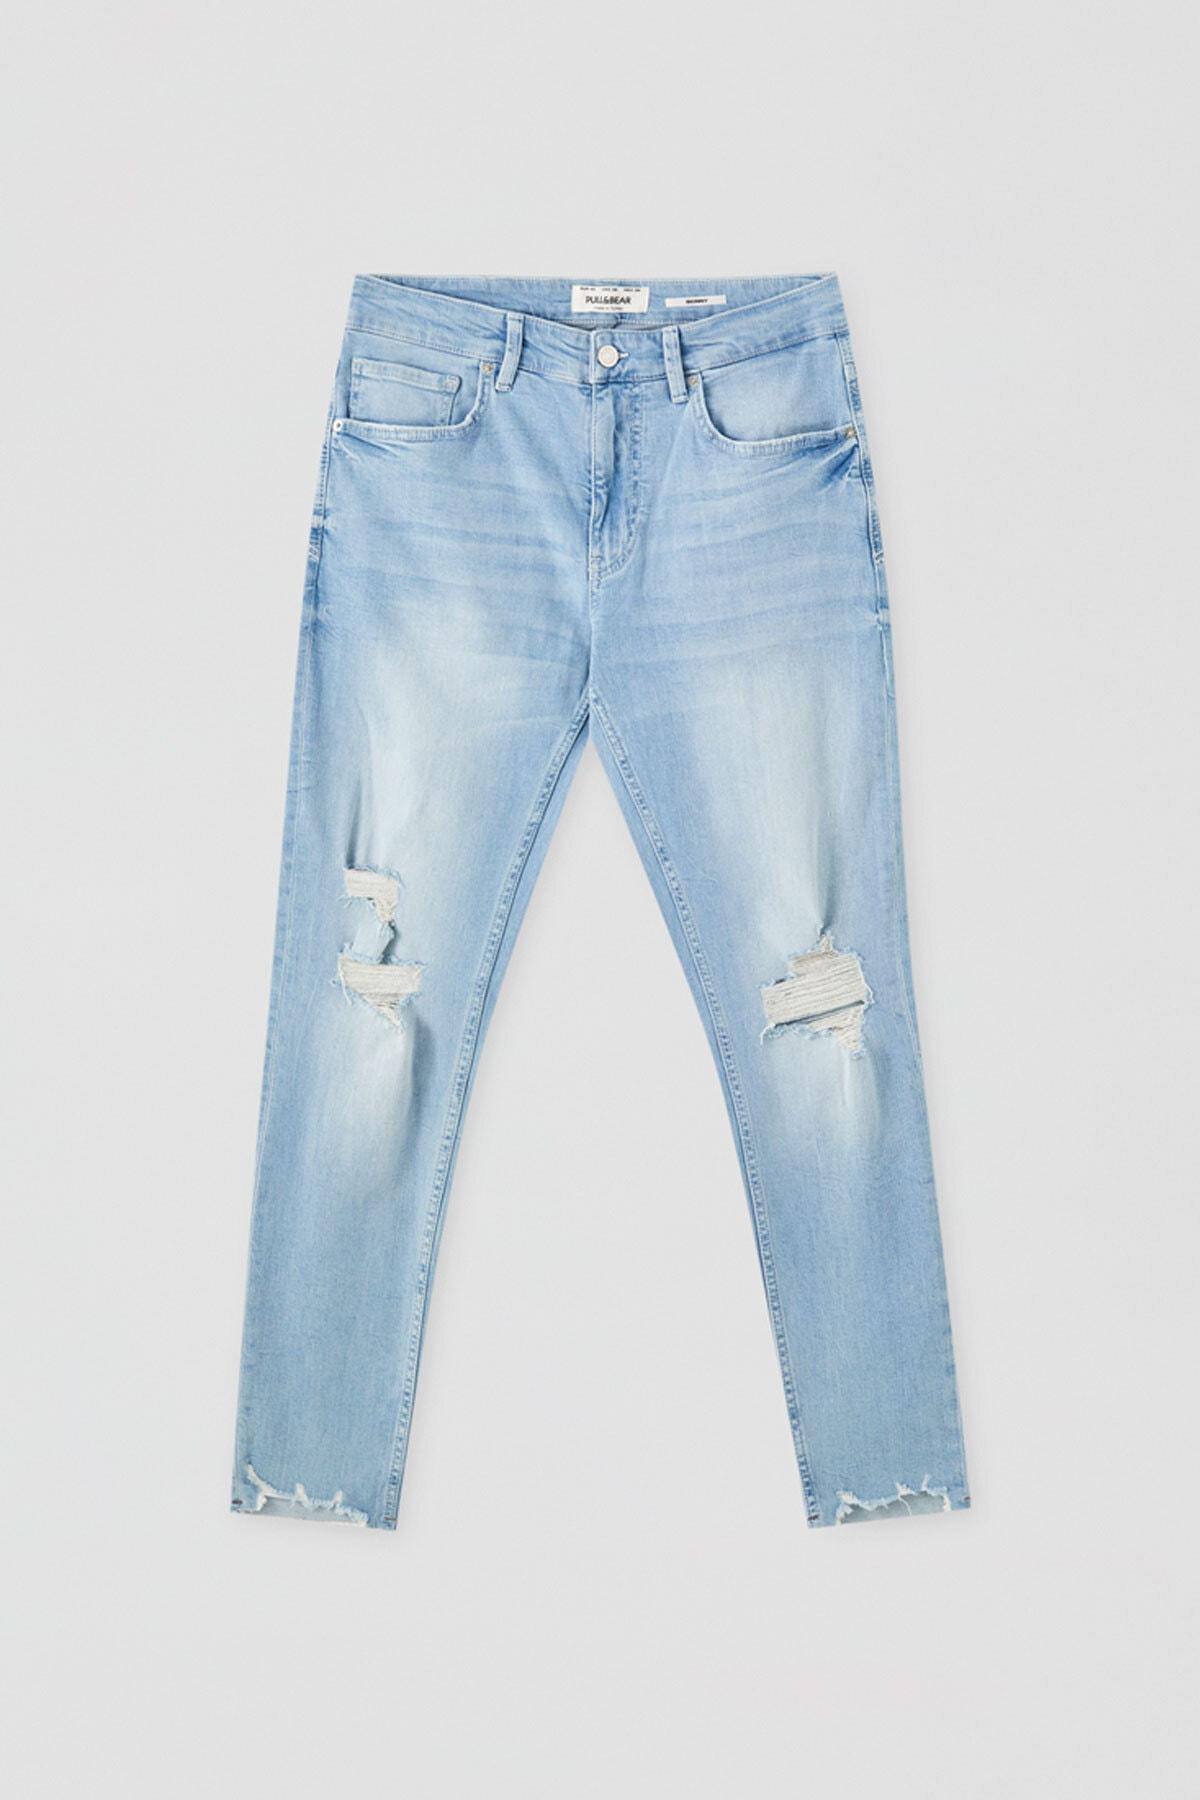 Pull & Bear Erkek Distressed Premium Skinny Fit Jean 05682563